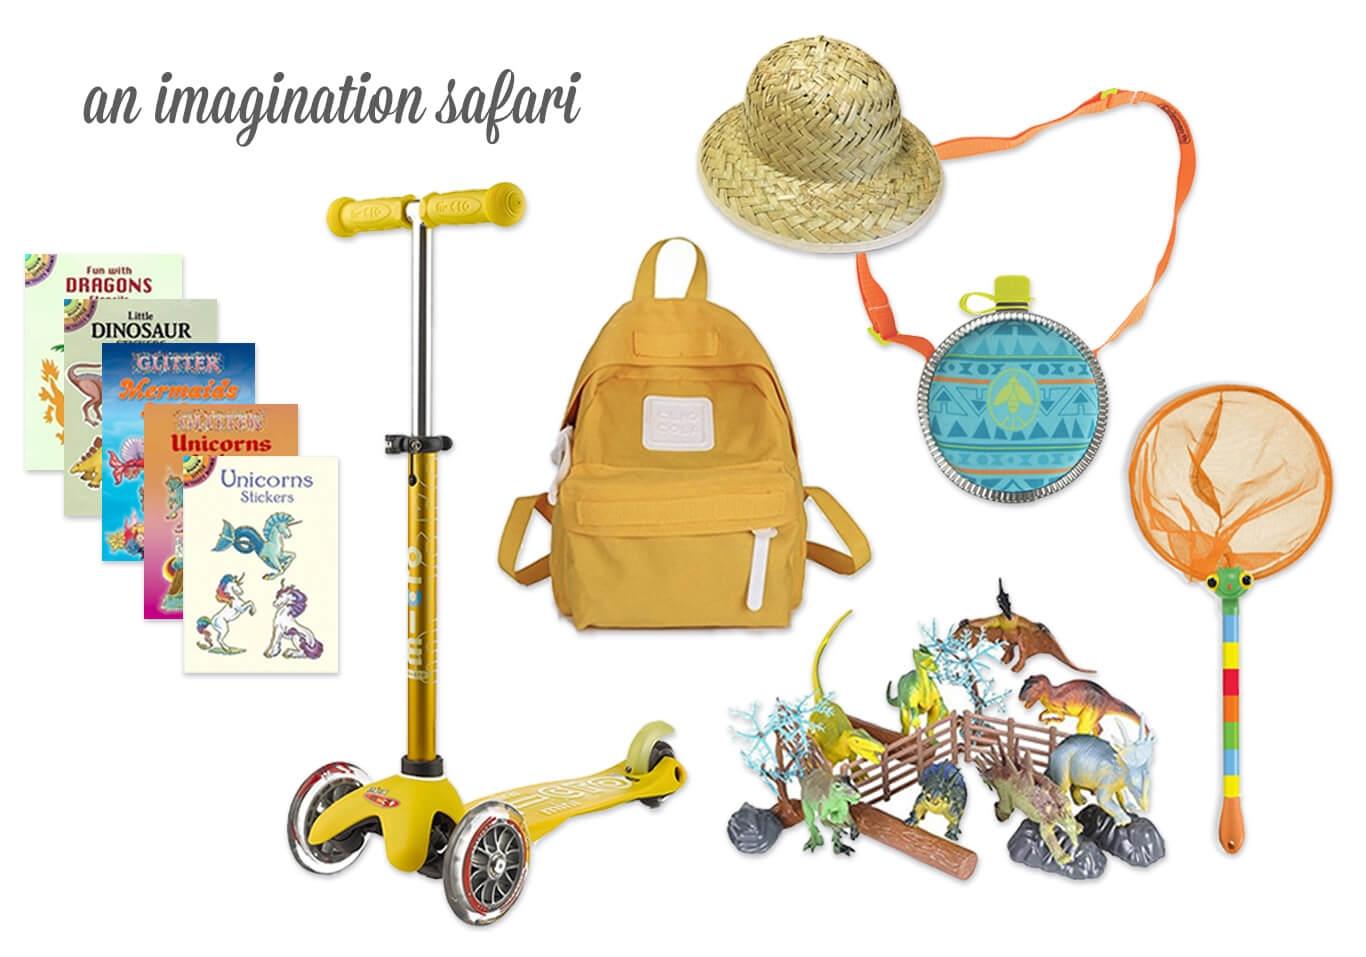 Imaginary Animal Activity Books / Scooter / Safari Hat, Backpack, + Canteen / Unicorn Net / Dinosaurs